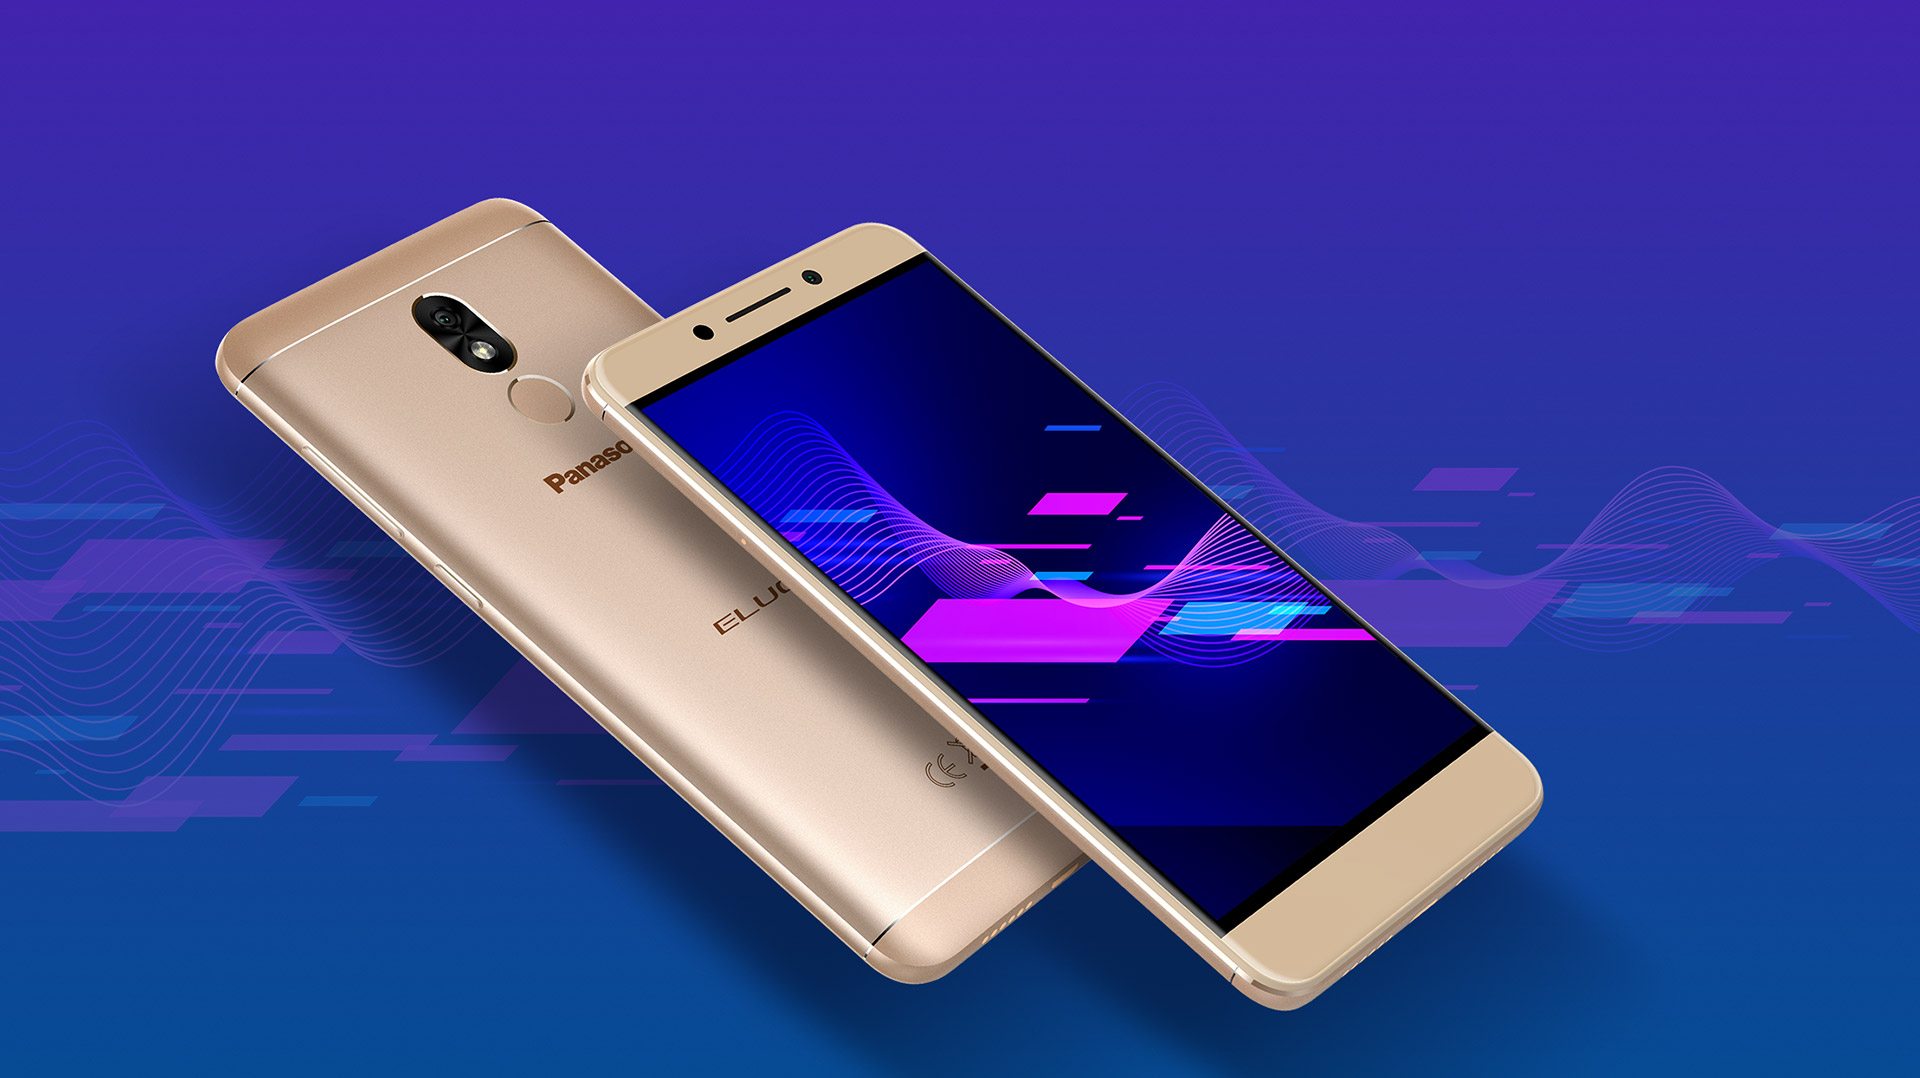 Panasonic, Eluga series, Eluga Ray 800, India, Smartphone, Mobile phone, Gadget news, Technology news